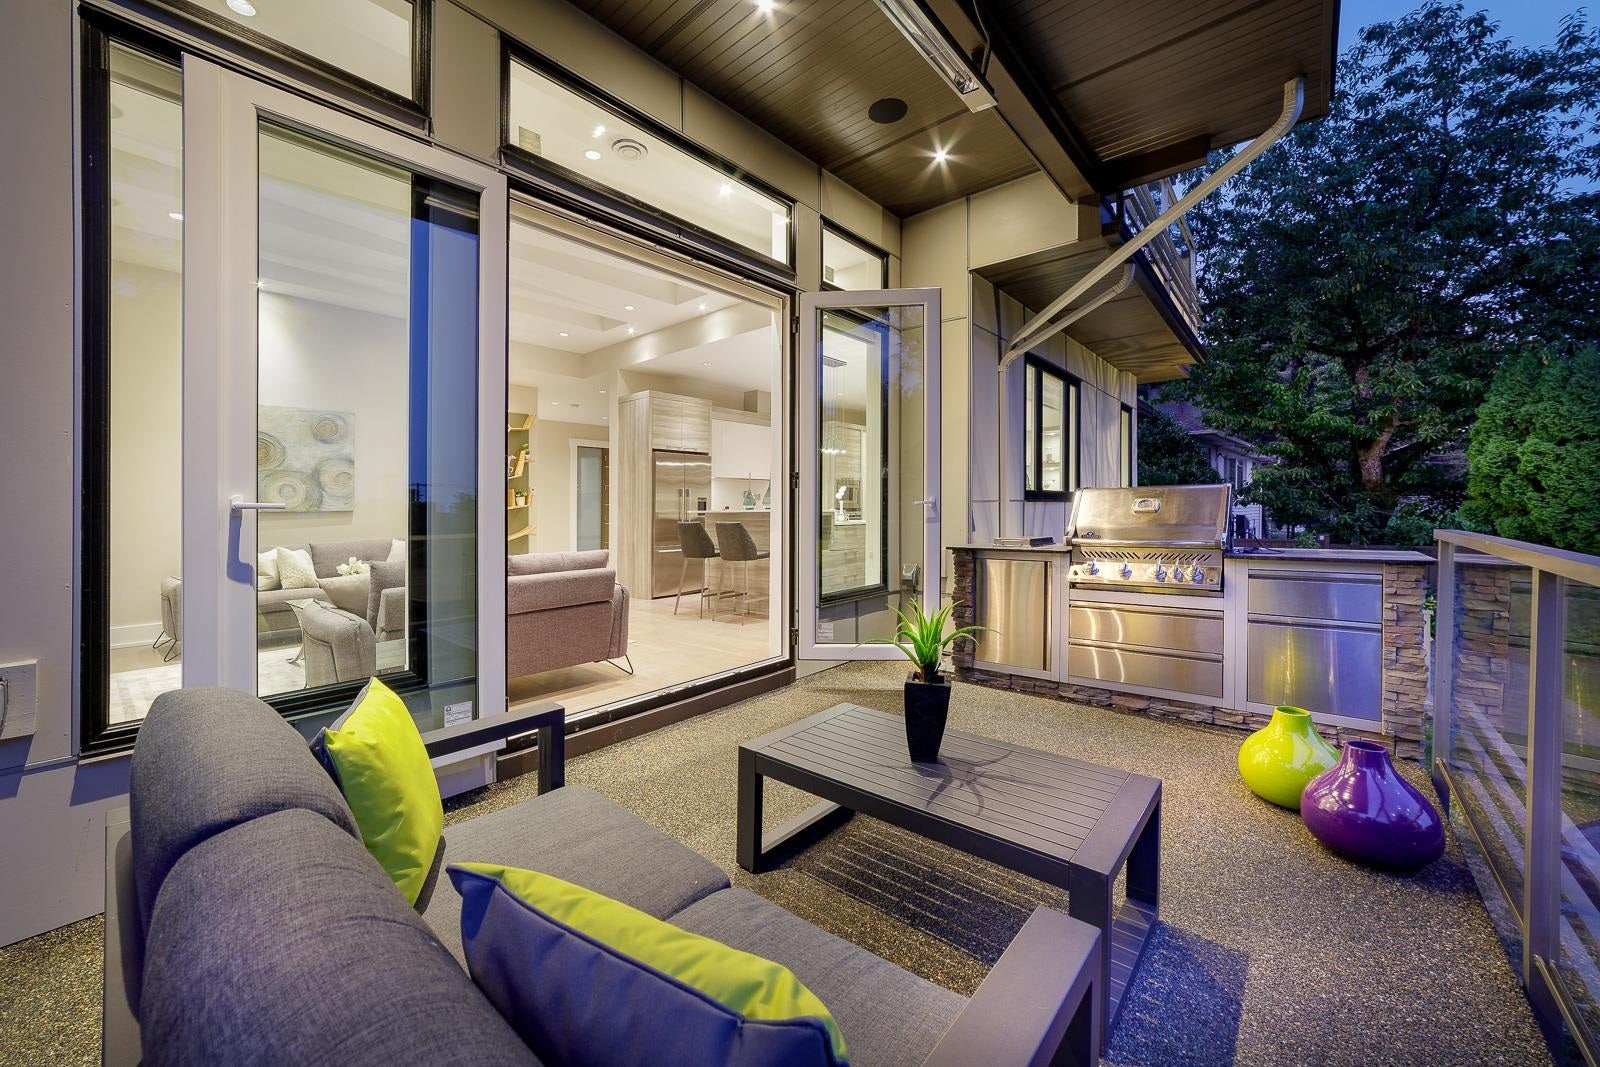 517 GRANADA CRESCENT - Upper Delbrook House/Single Family for sale, 8 Bedrooms (R2615057) - #32